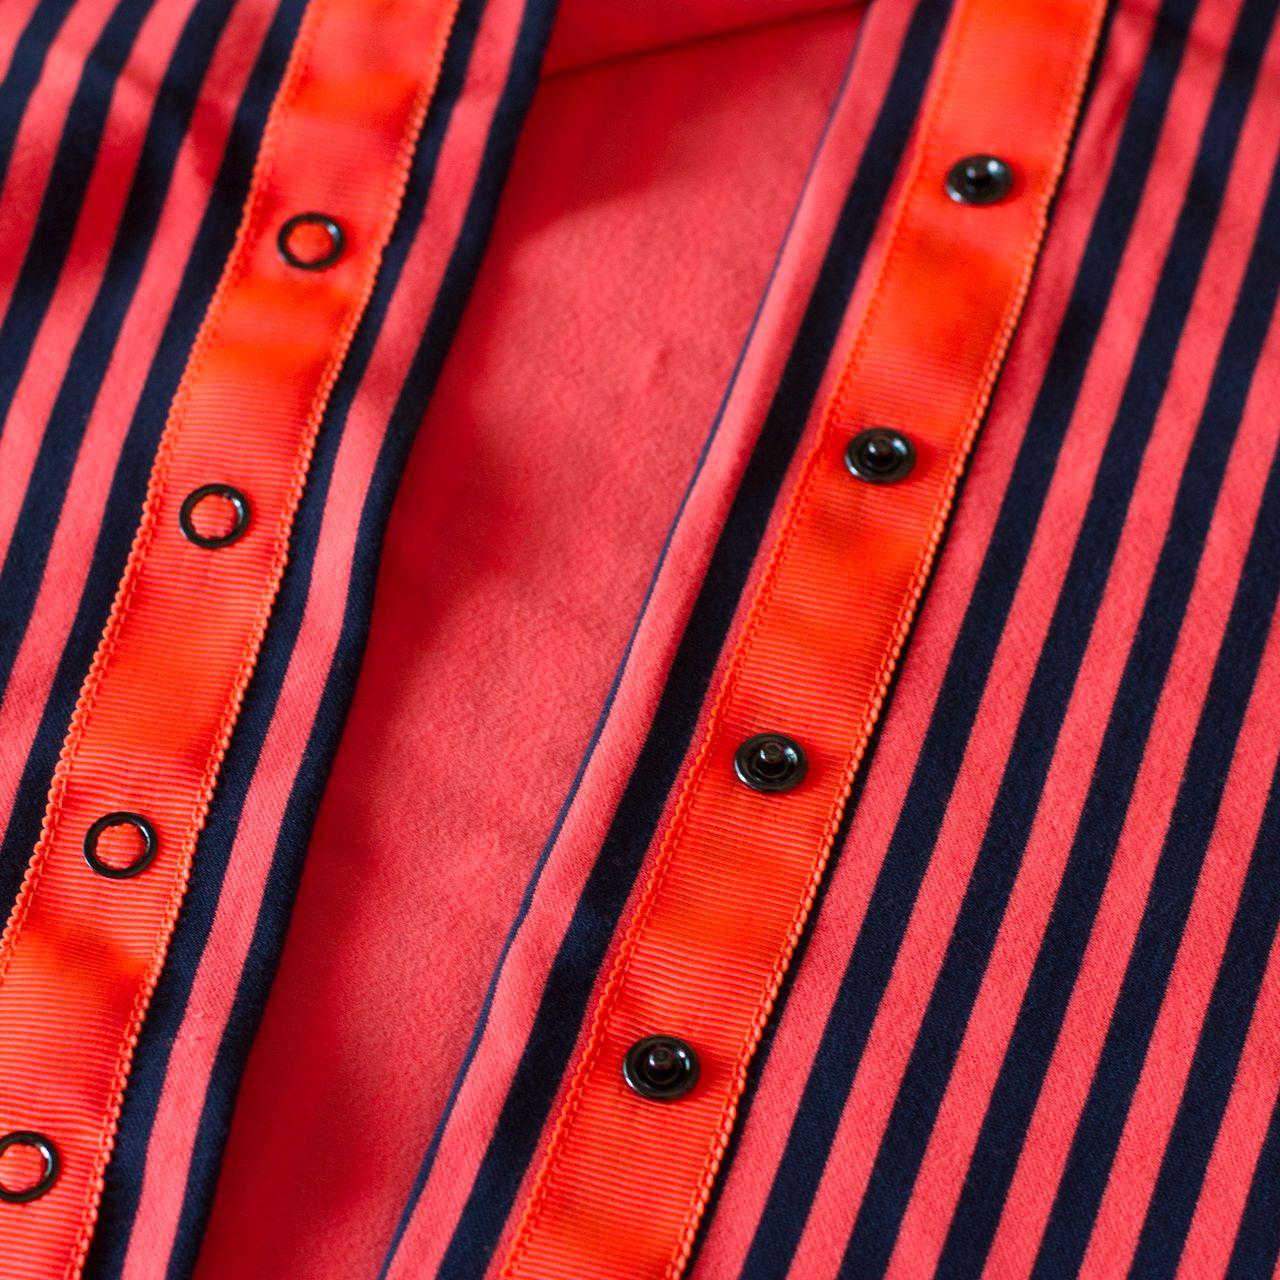 Lululemon Vinyasa Scarf - Classic Stripe Light Flare Inkwell